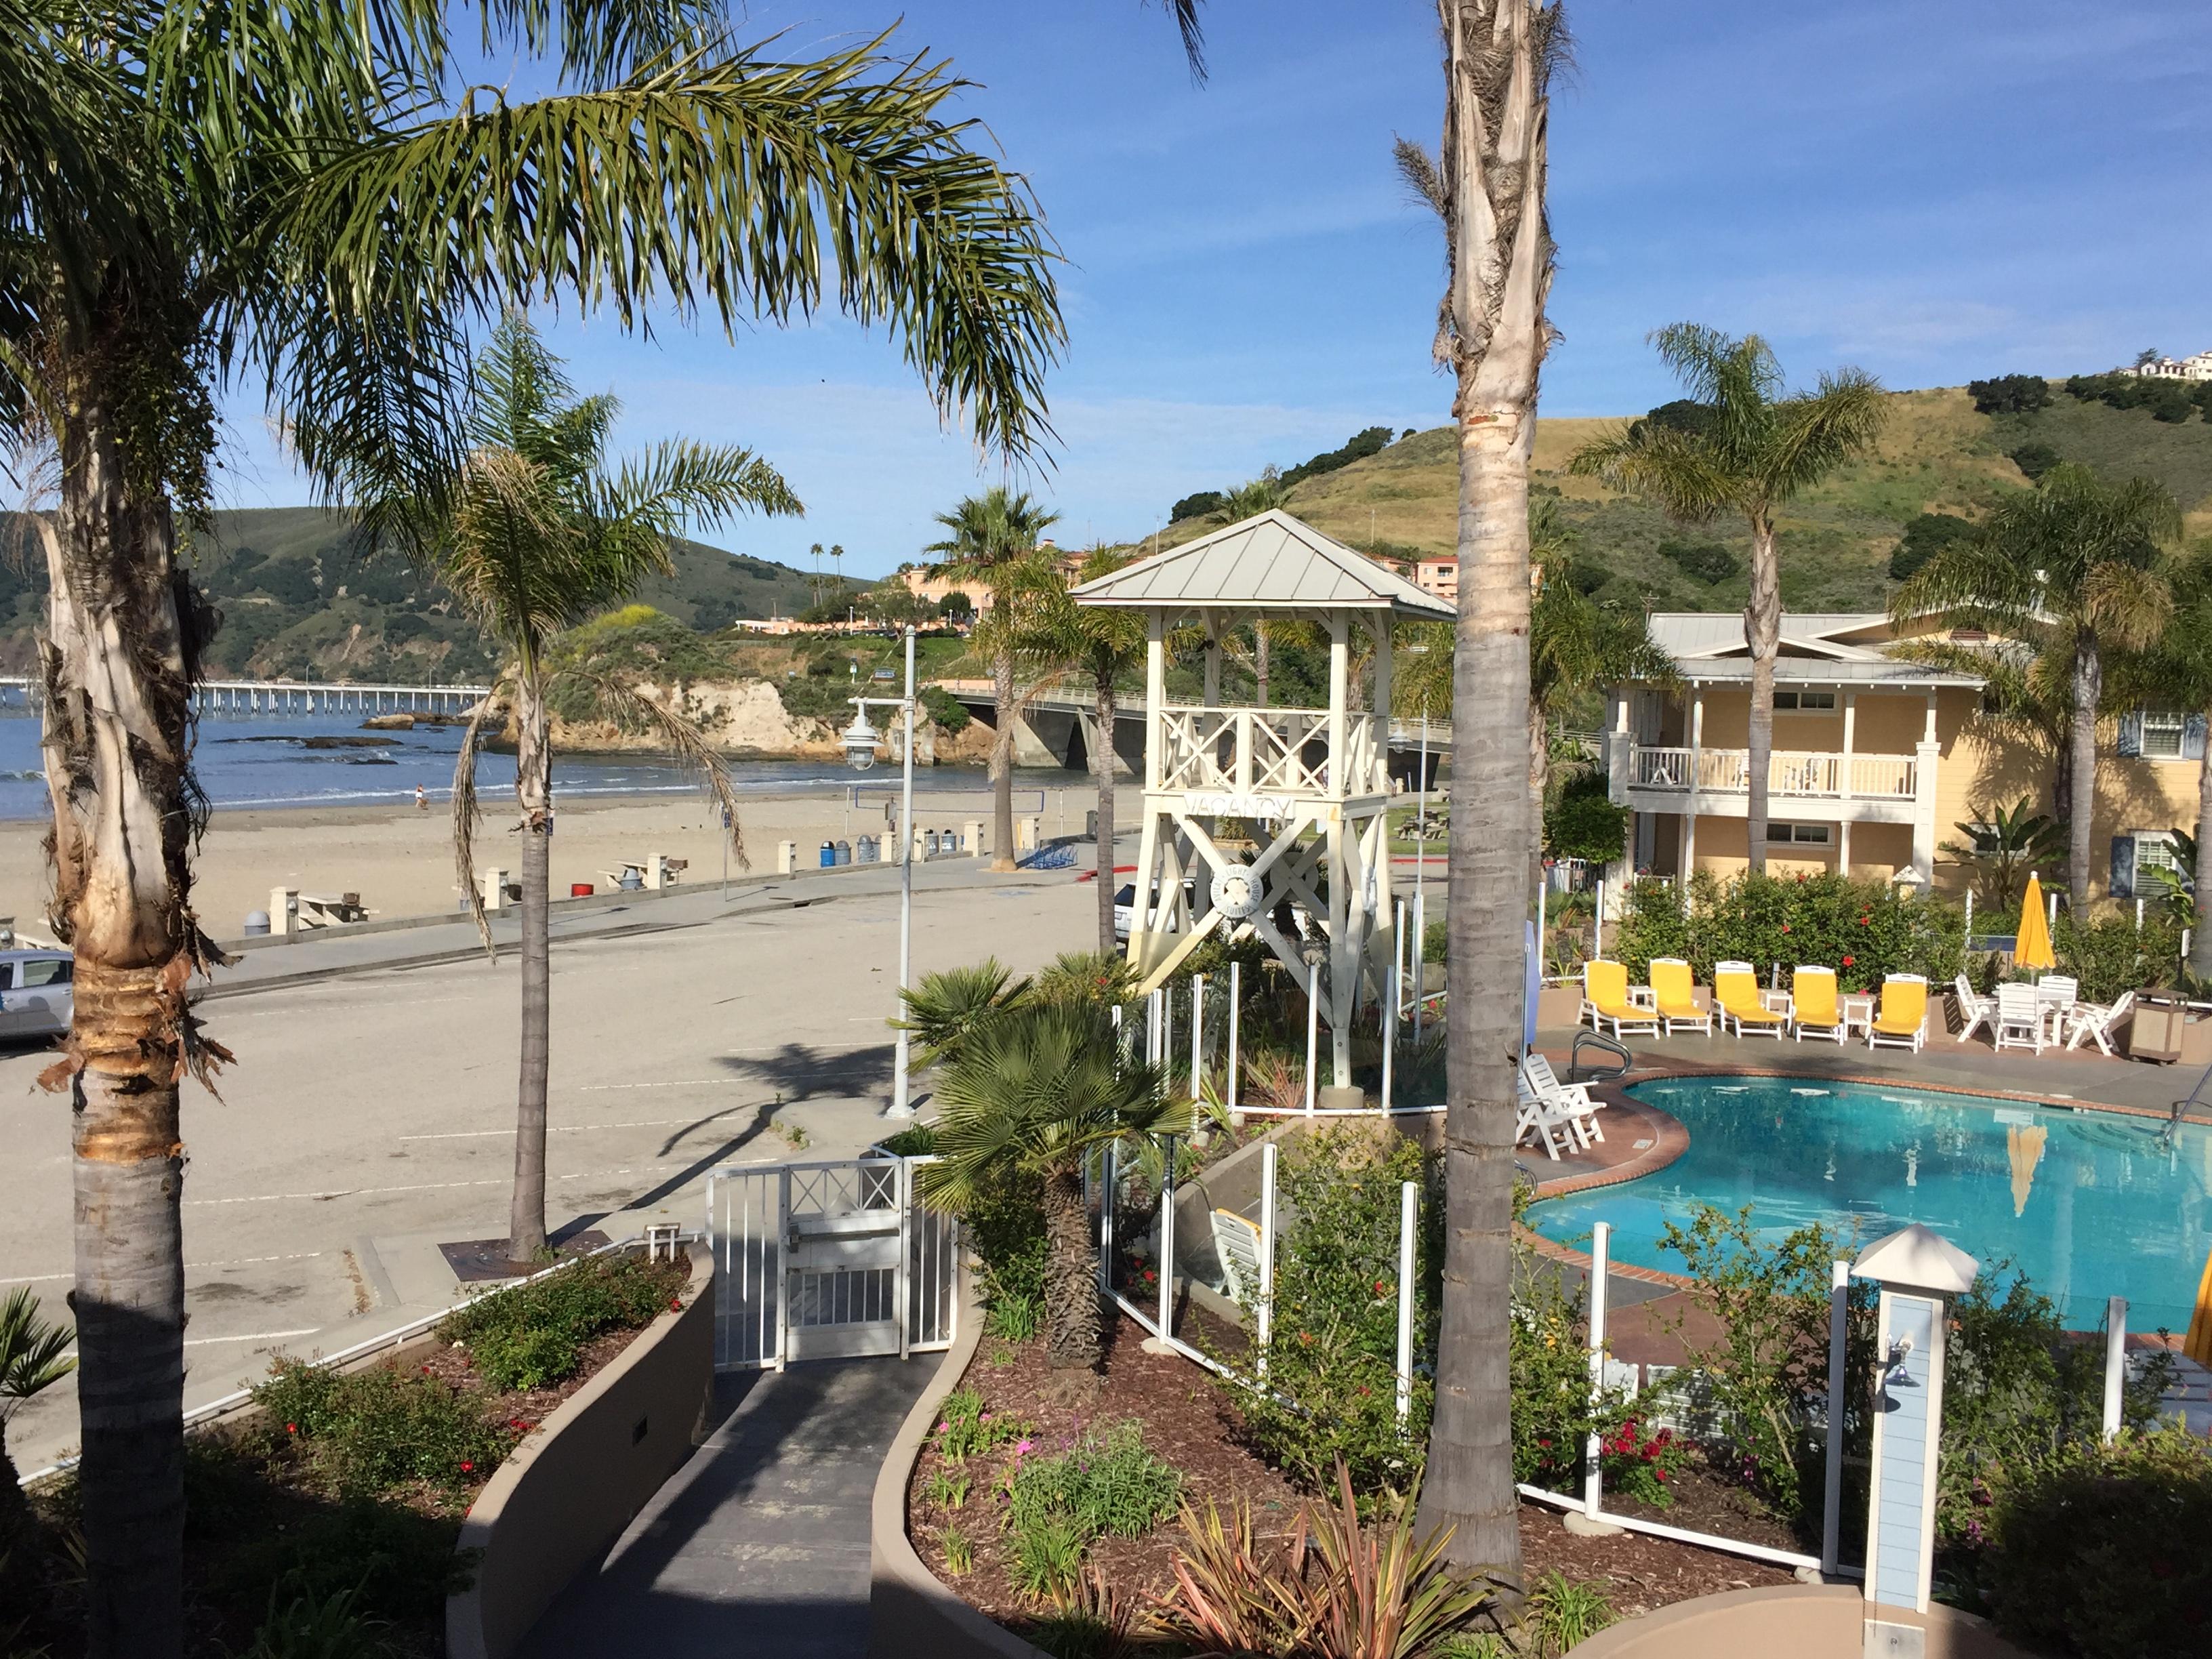 Hotel at Avila Beach, CA